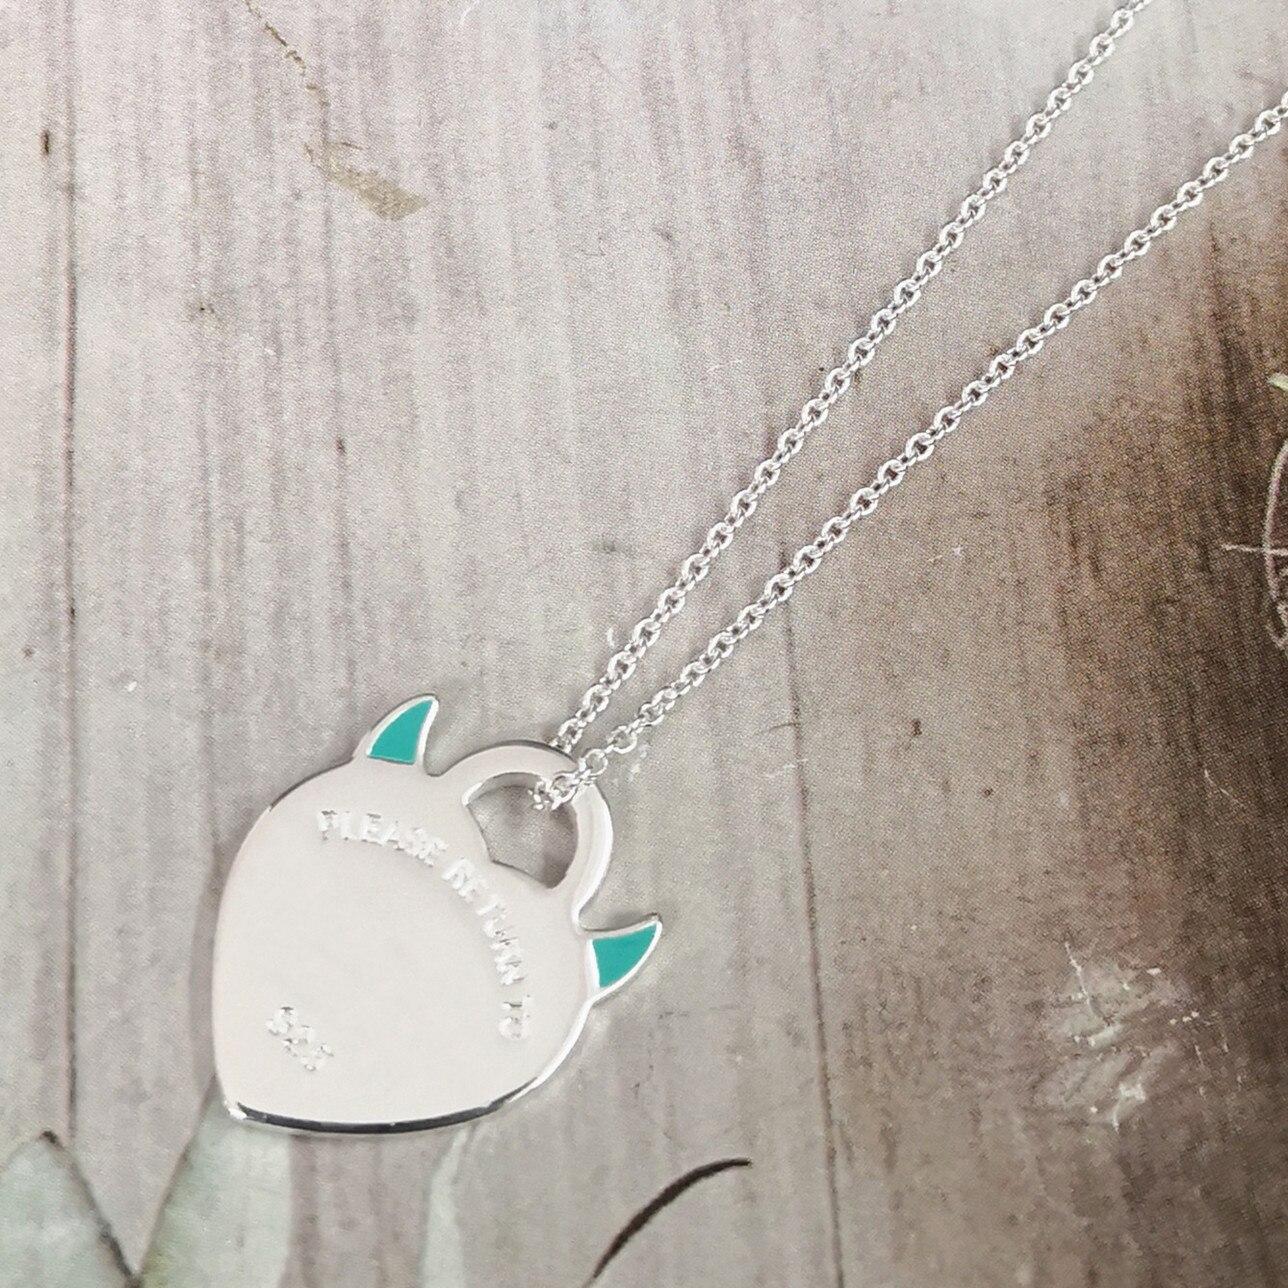 Ms S925 الفضة النقية الكلاسيكية الوردي المينا الشيطان قرون على شكل قلب قلادة فضية قلادة السماوي الغراء الأزرق على شكل قلب قلادة